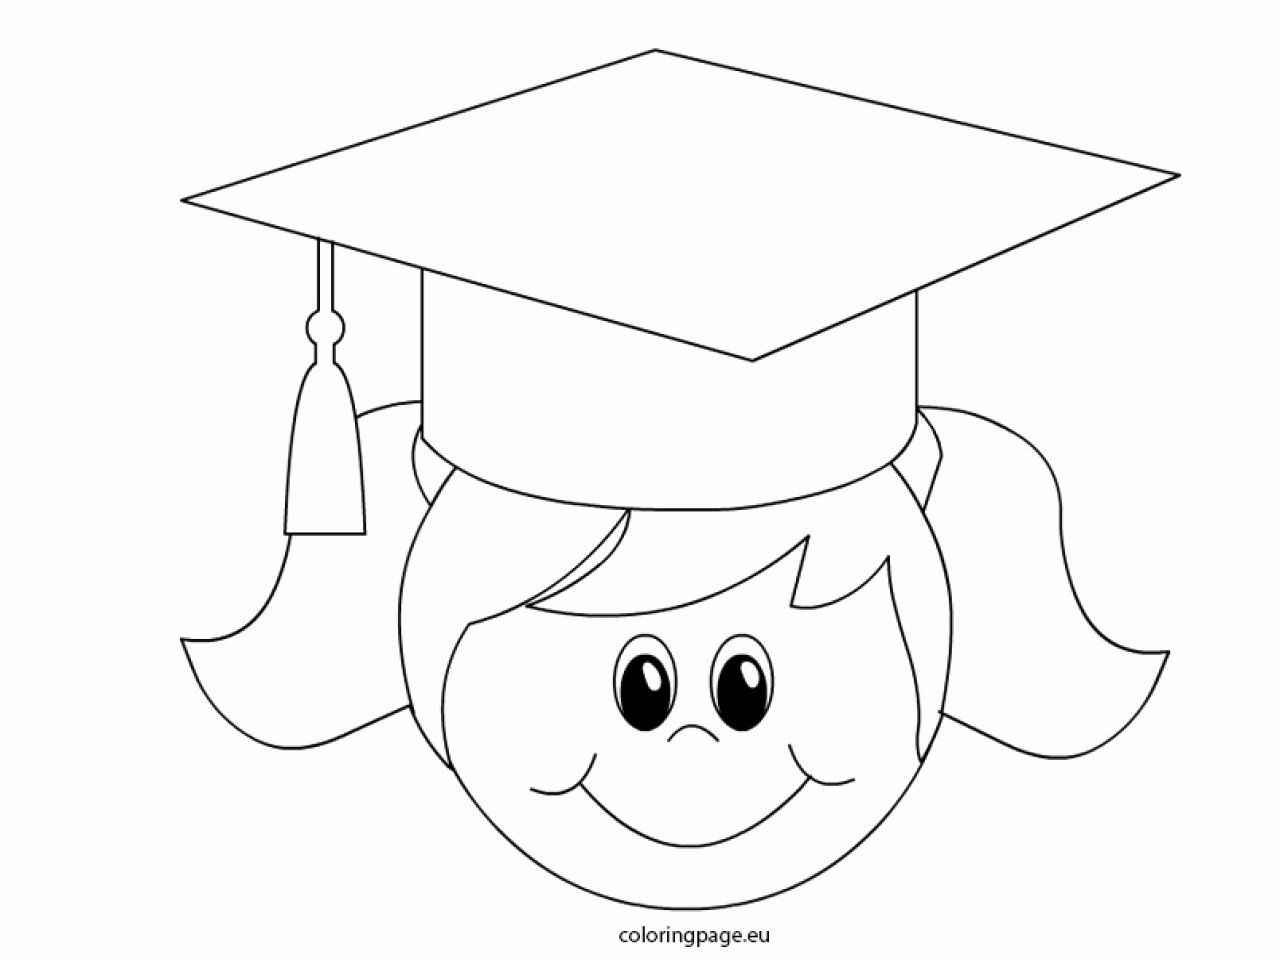 Graduation Cap Coloring Page Lovely Graduation Cap Coloring Page Printable Colouring Graduation Girl Preschool Graduation Graduation Cap